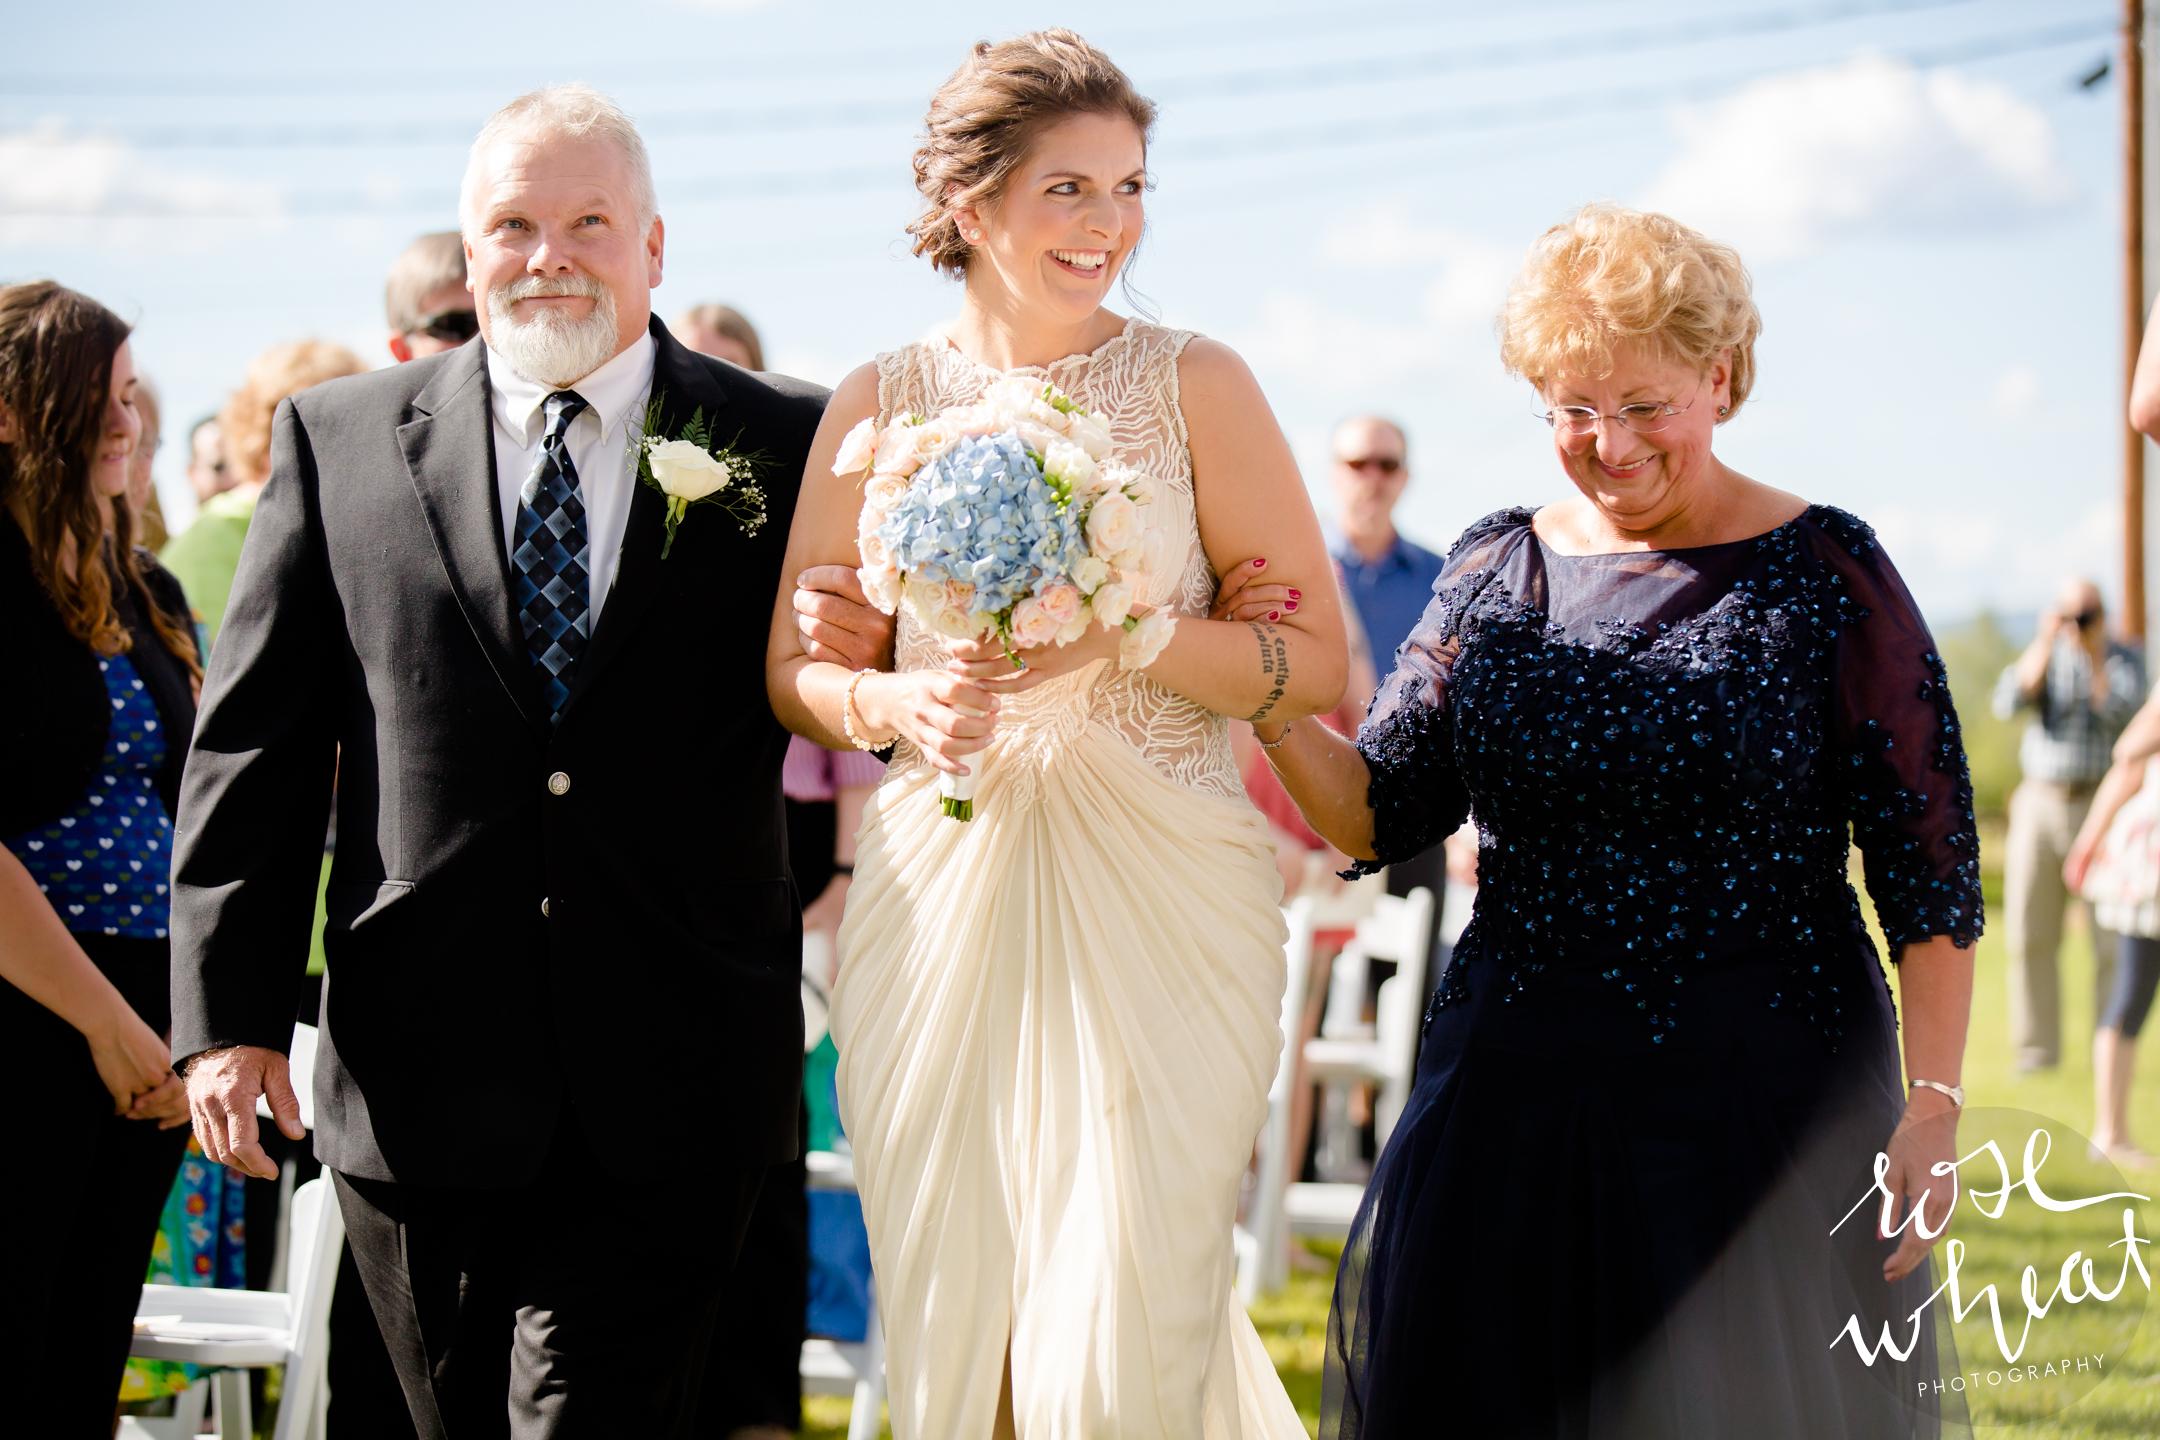 12. Birch_Hill_Fairbanks_Ak_Wedding_Rose_Wheat_Photogrpahy-1.jpg-07.jpg